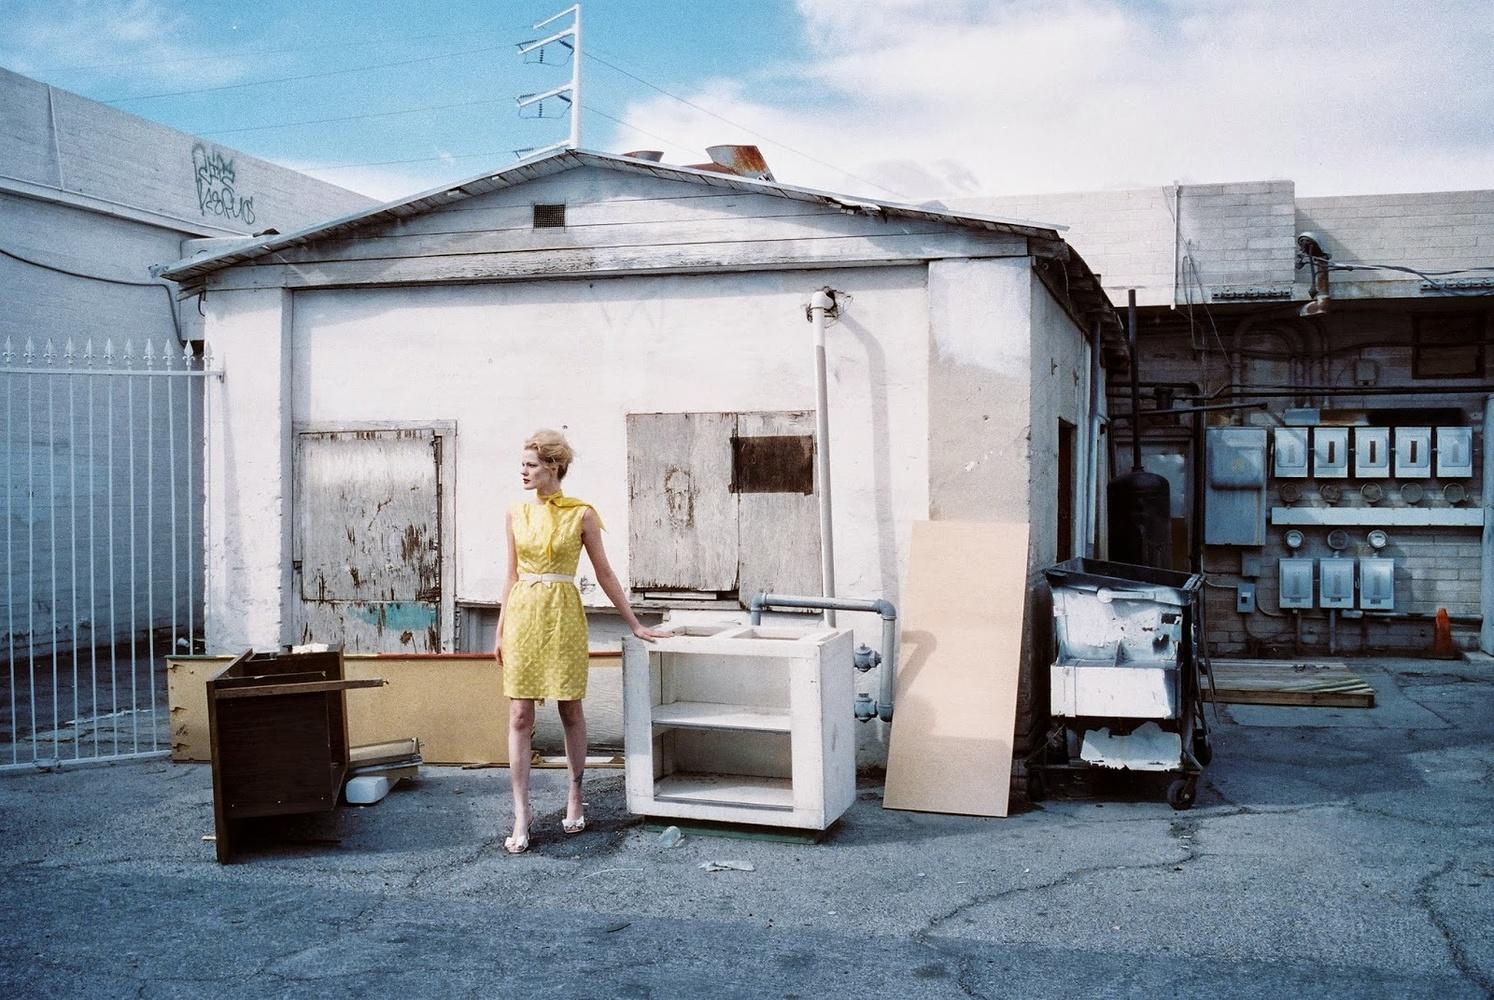 Jan Scholz daylight cinestill 800t photo